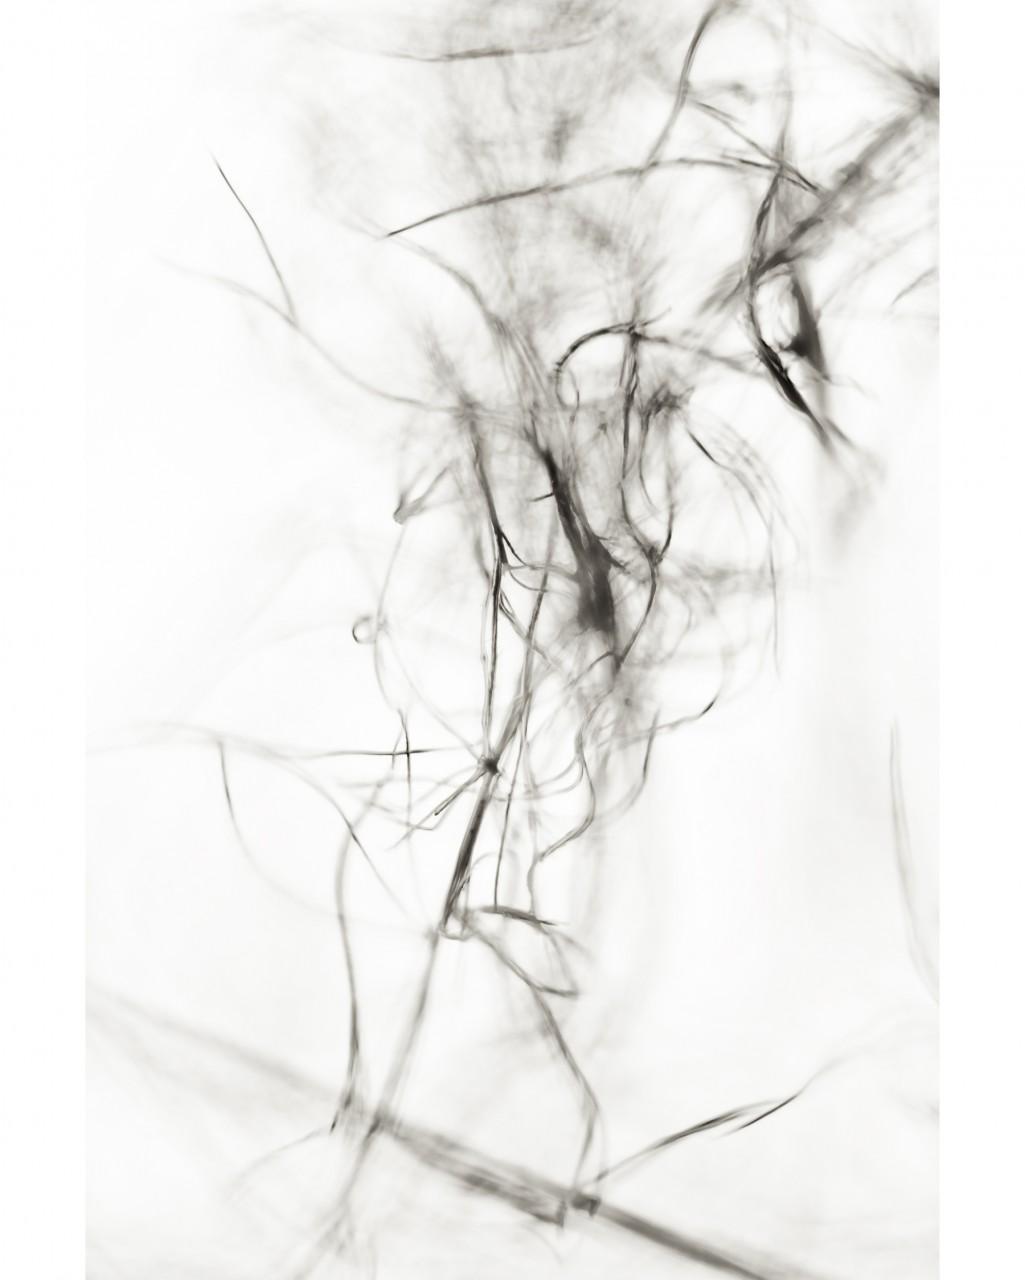 28_Untitled_7767